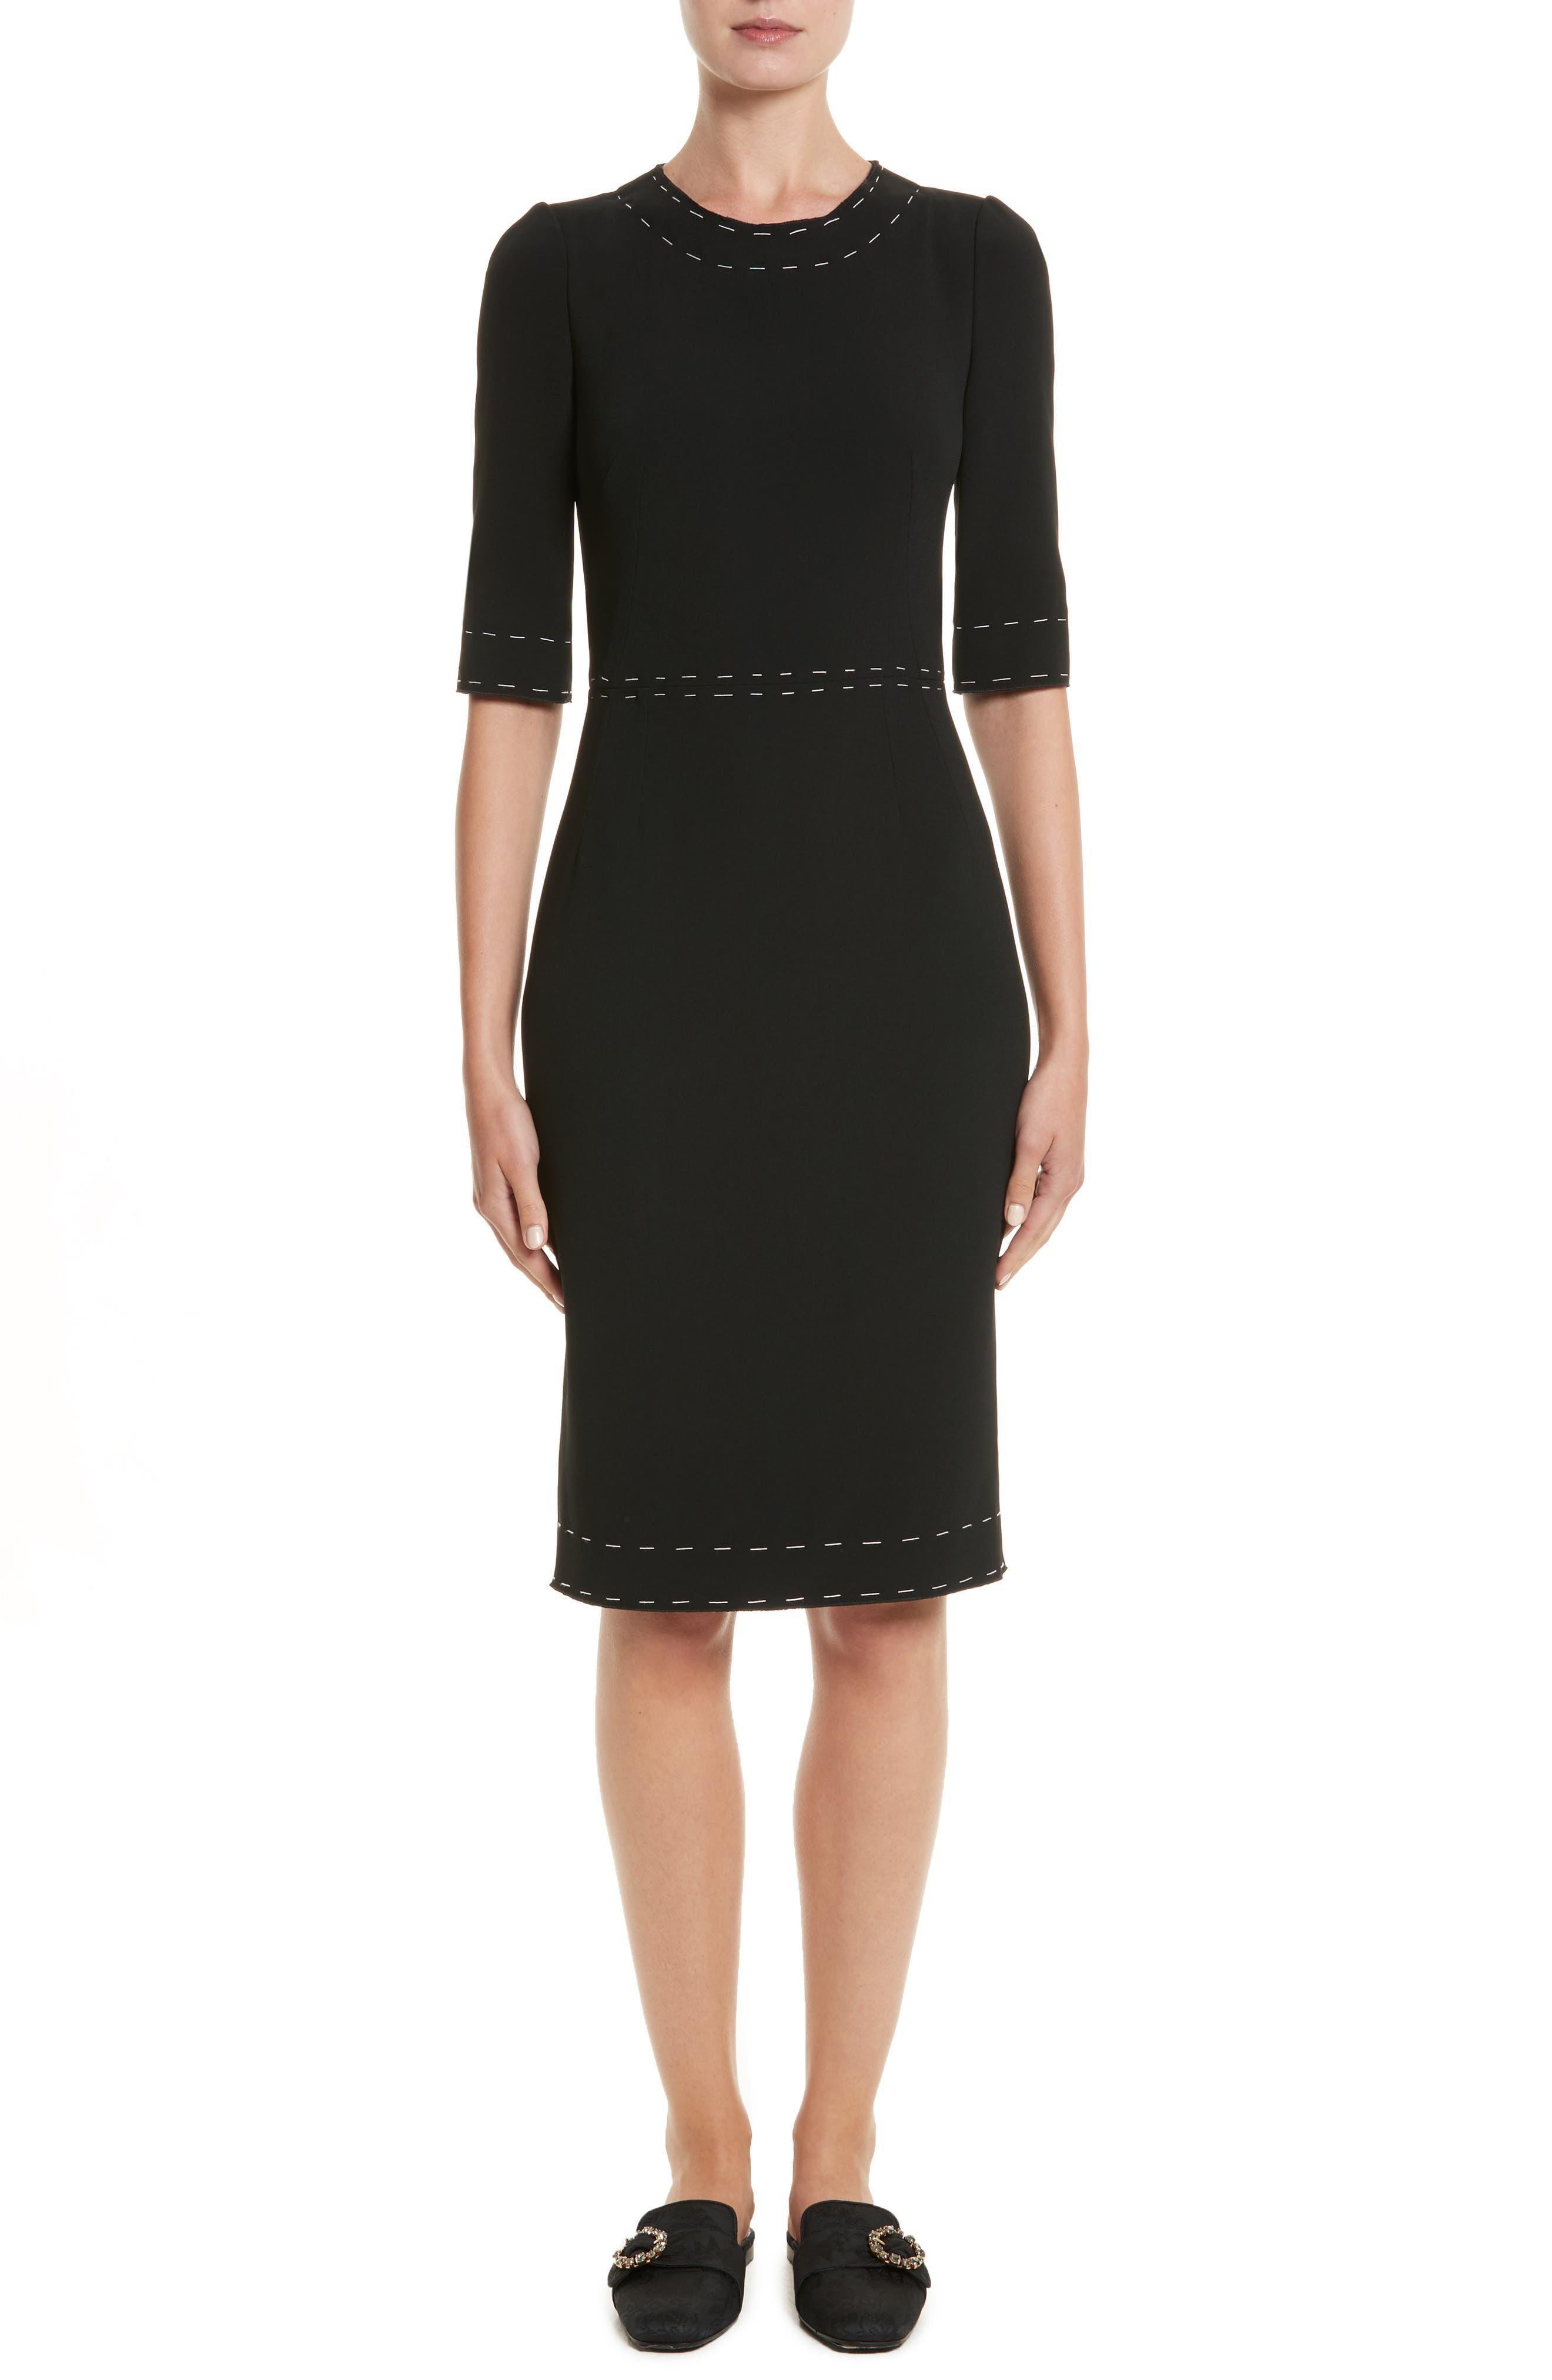 Dolce&Gabbana Stretch Cady Sheath Dress